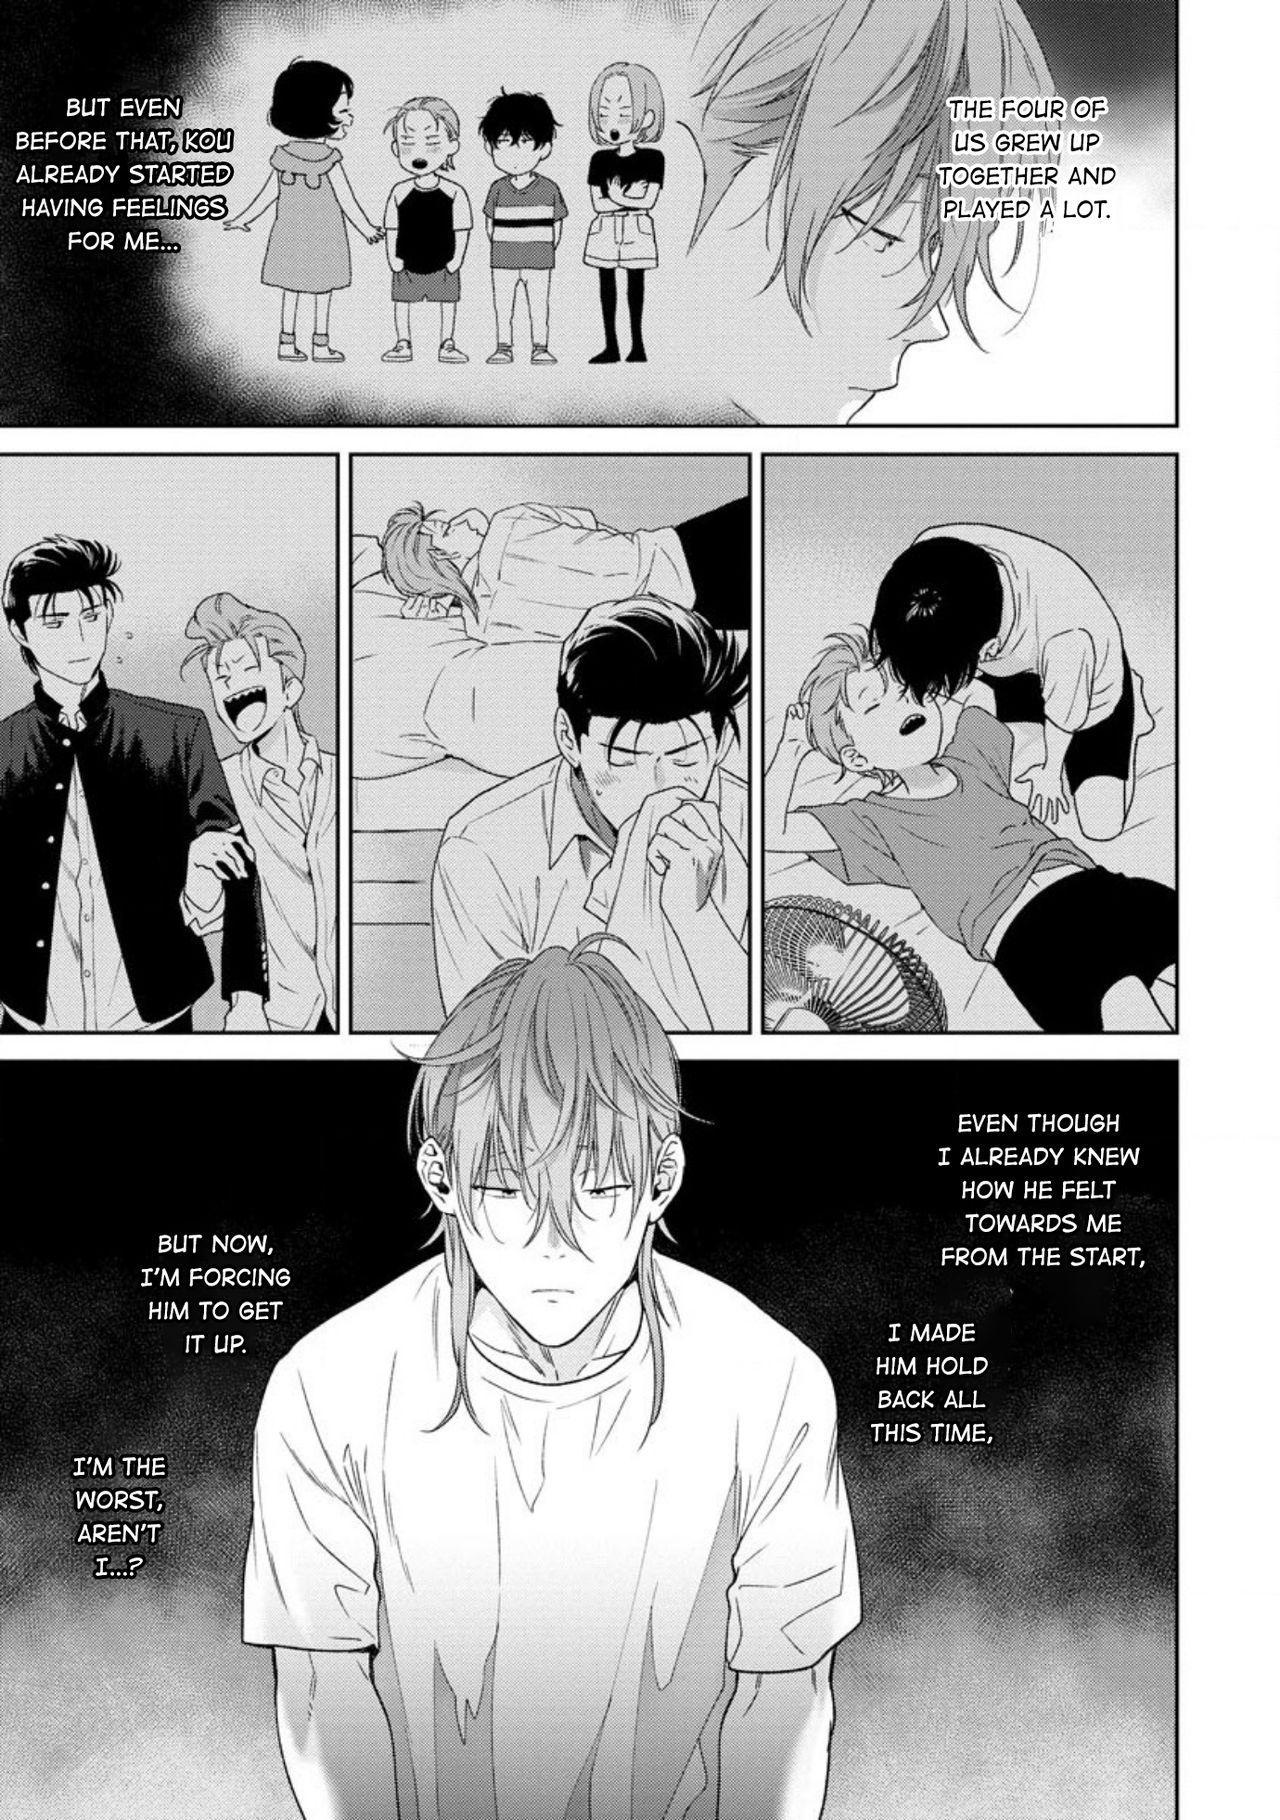 [Hiiragi Nozomu] Nakasete Yaru yo Yankee-kun   I'll Make You Cry Ch. 1-5 + Extras [English] [Digital] 140